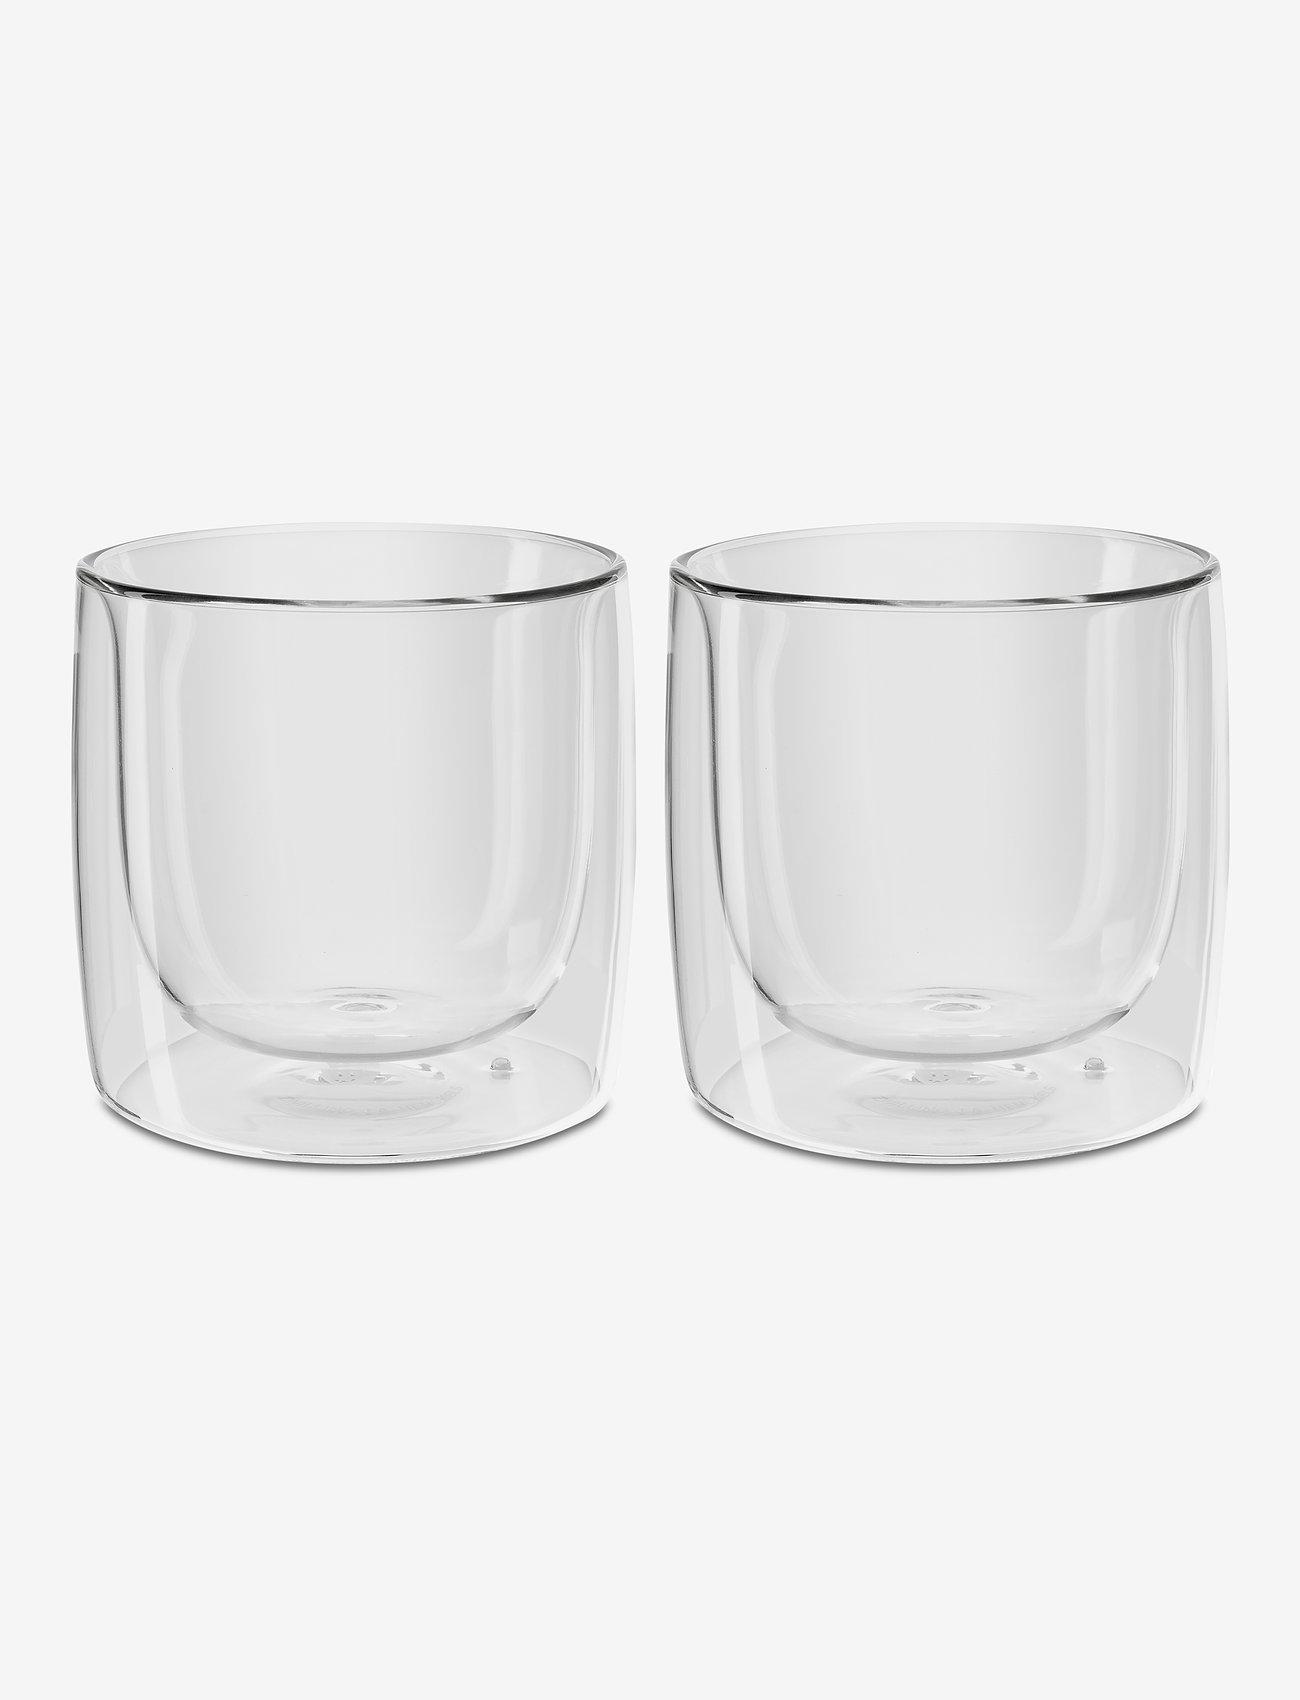 Zwilling - Whisky glass set - whiskyglass & cognacglass - transparent - 0